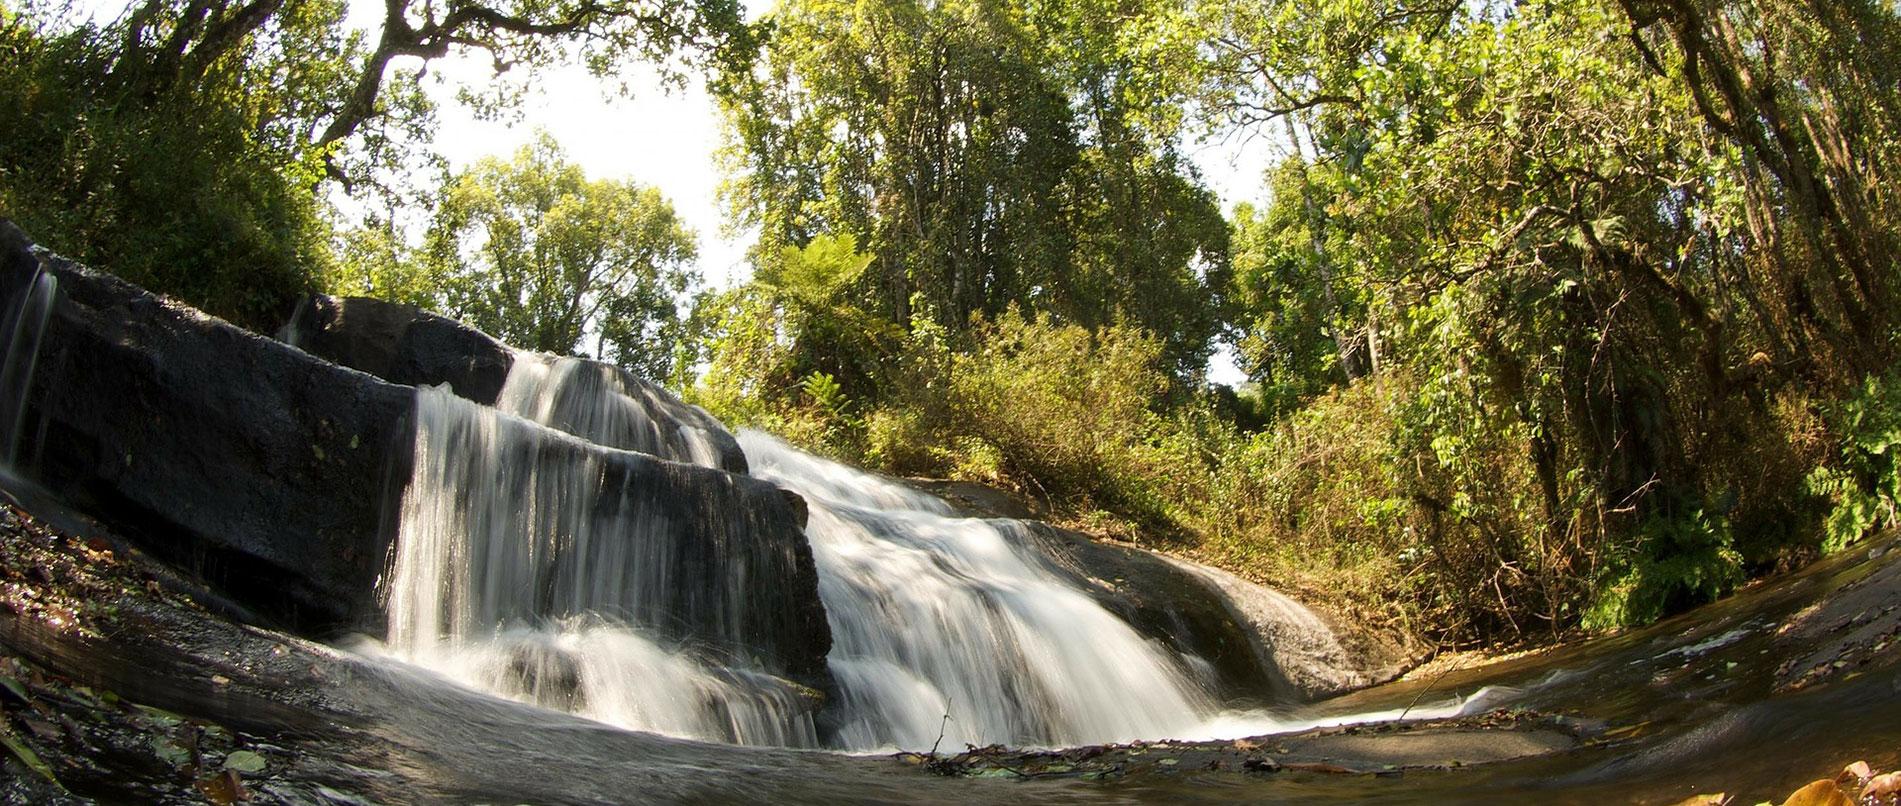 Renewable Energy project in malawi